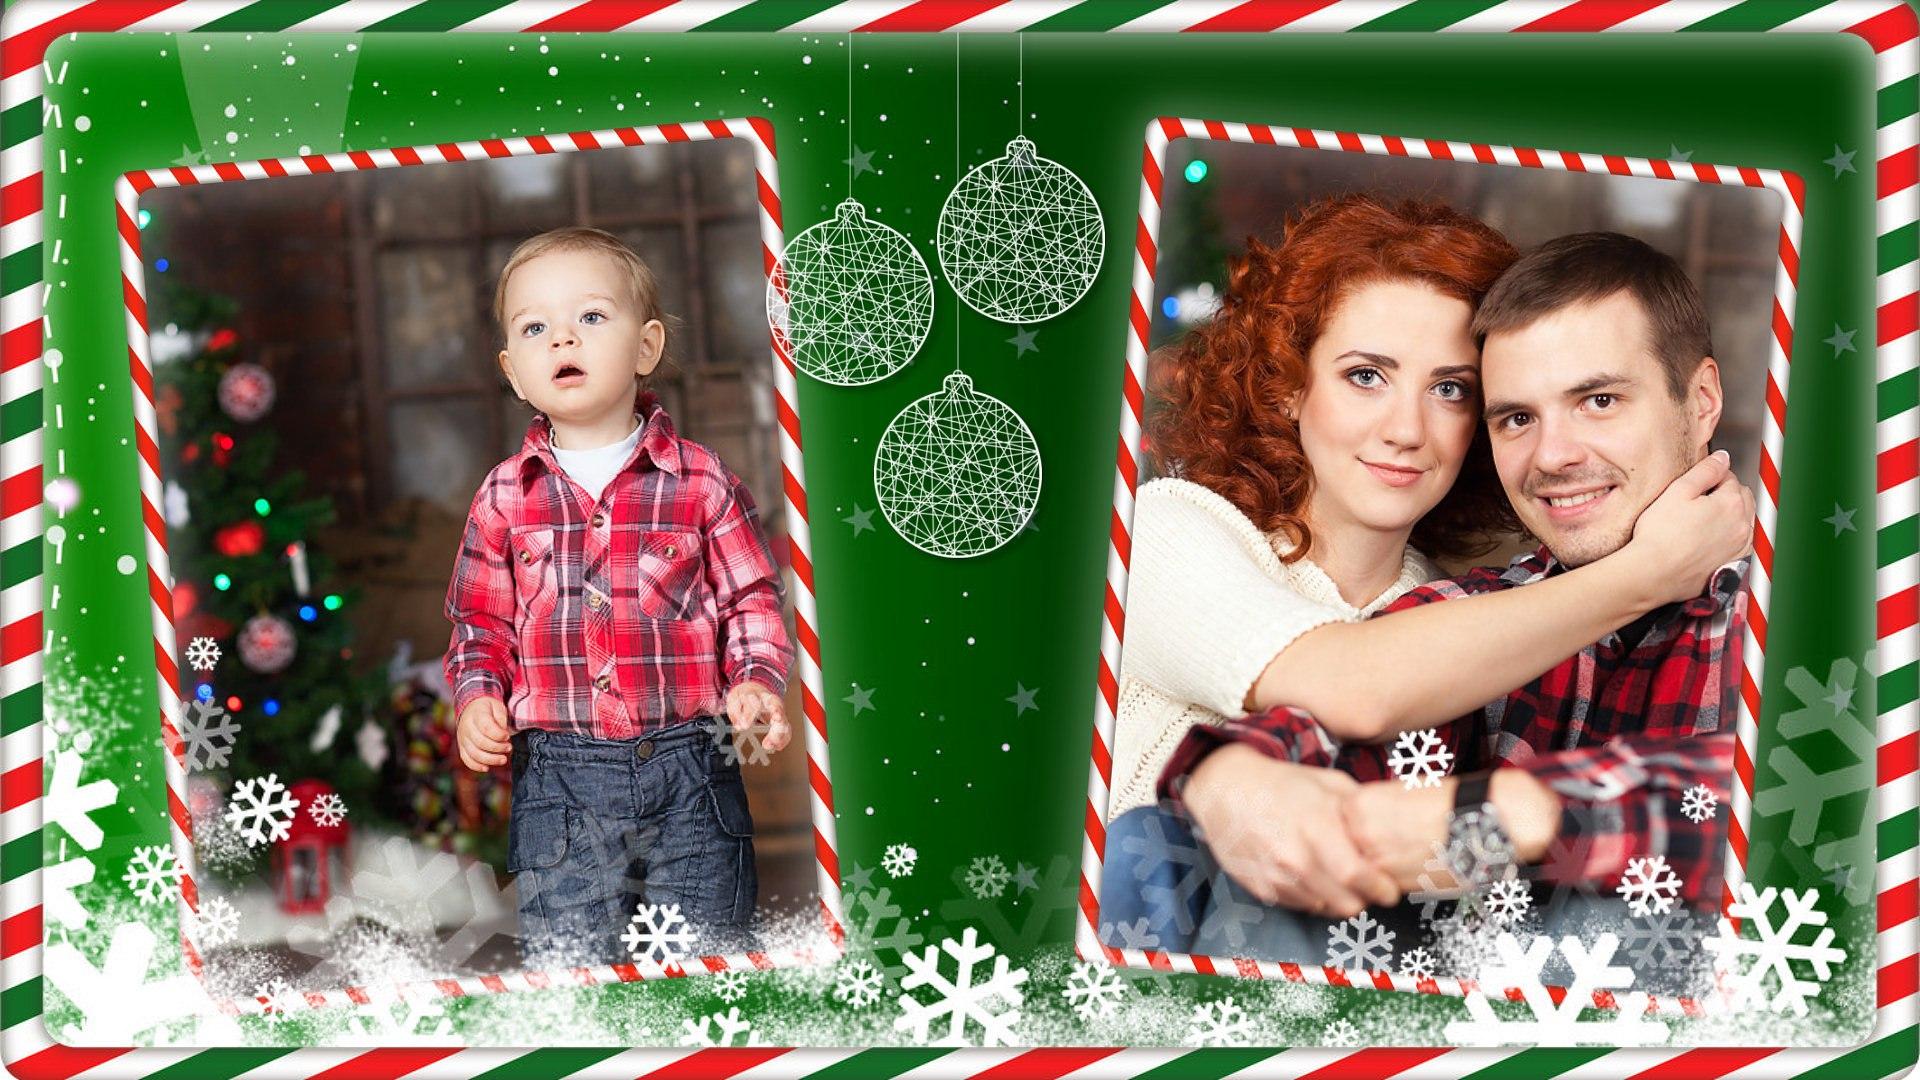 Christmas family | Новый год в кругу семьи